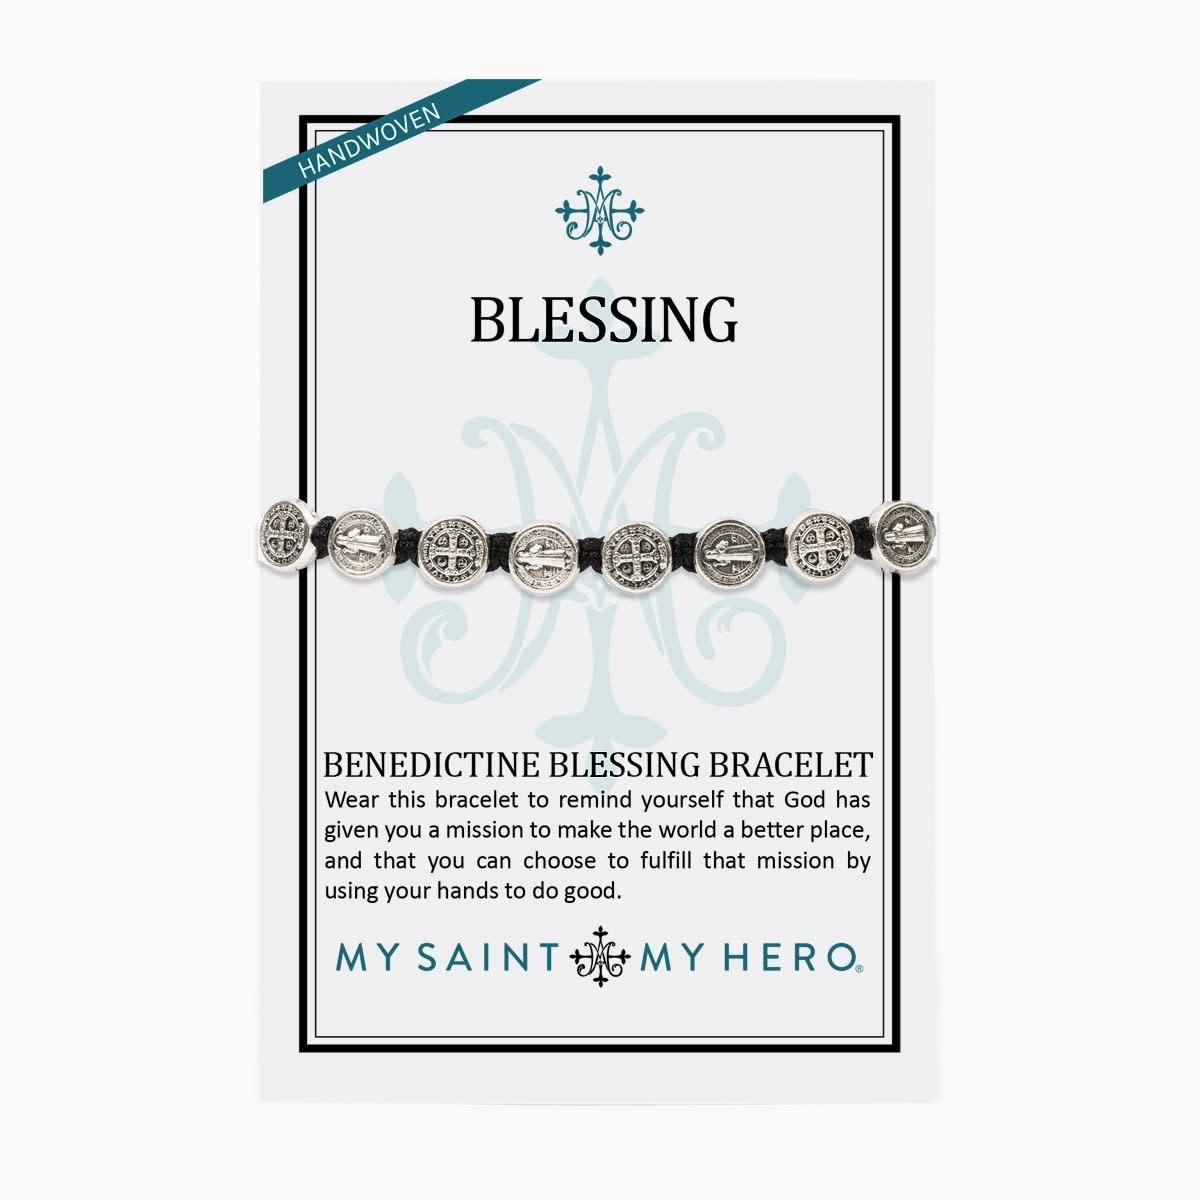 My Saint My Hero BR Benedictine